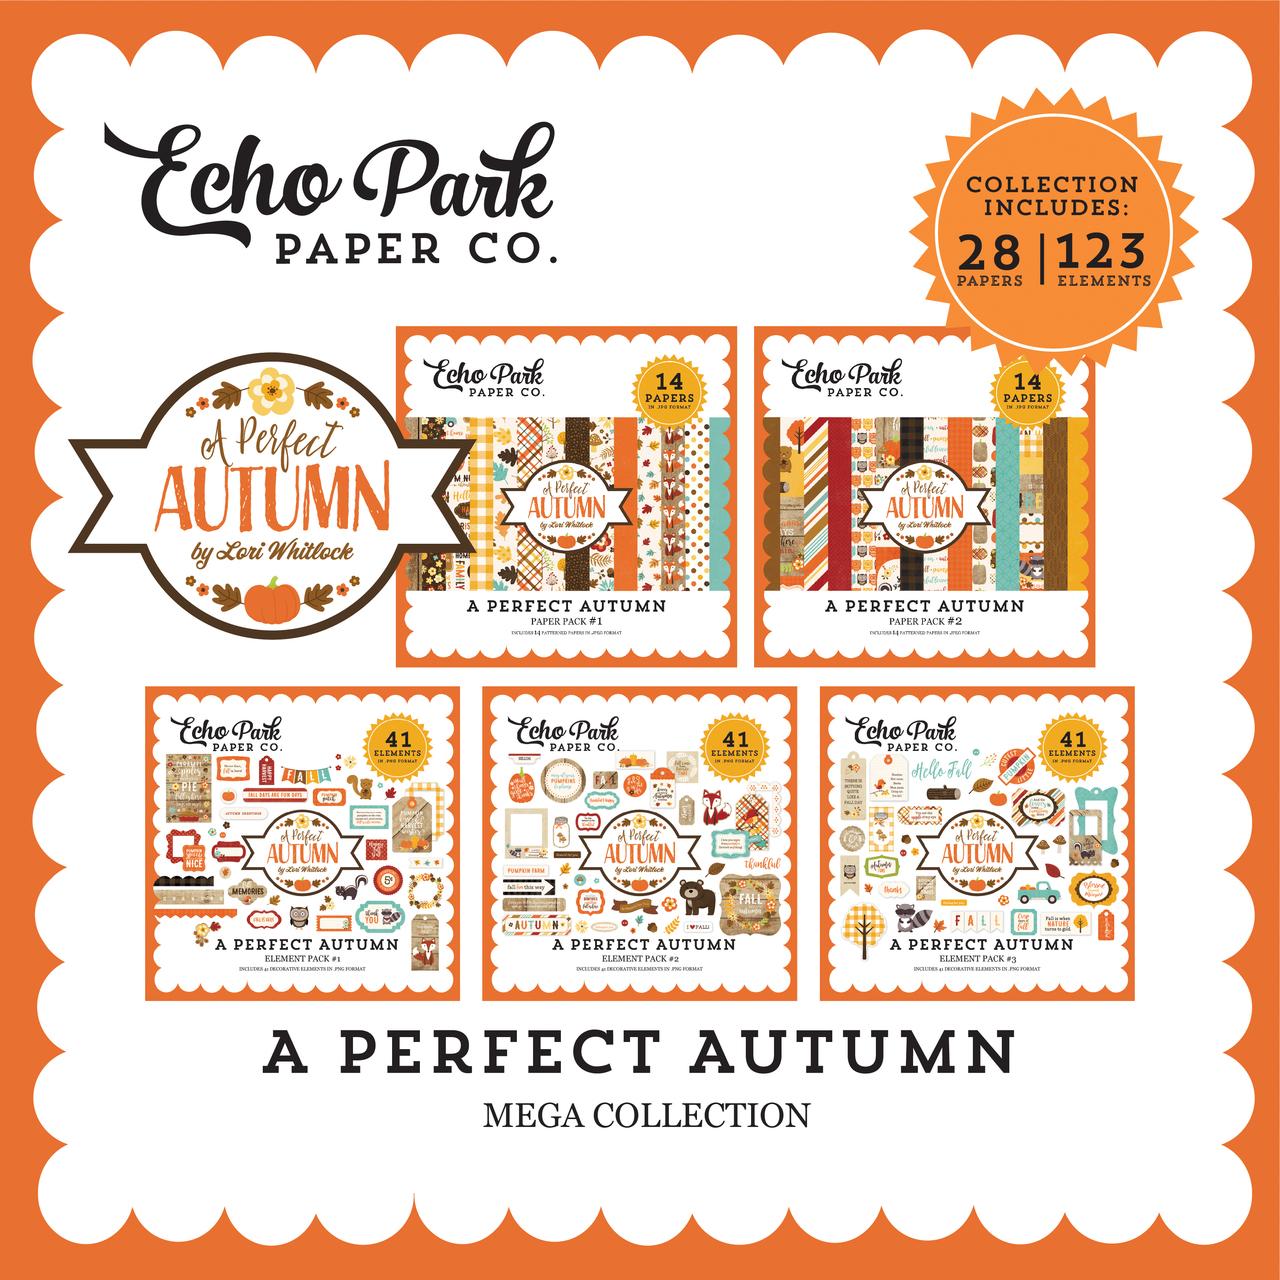 A Perfect Autumn Mega Collection